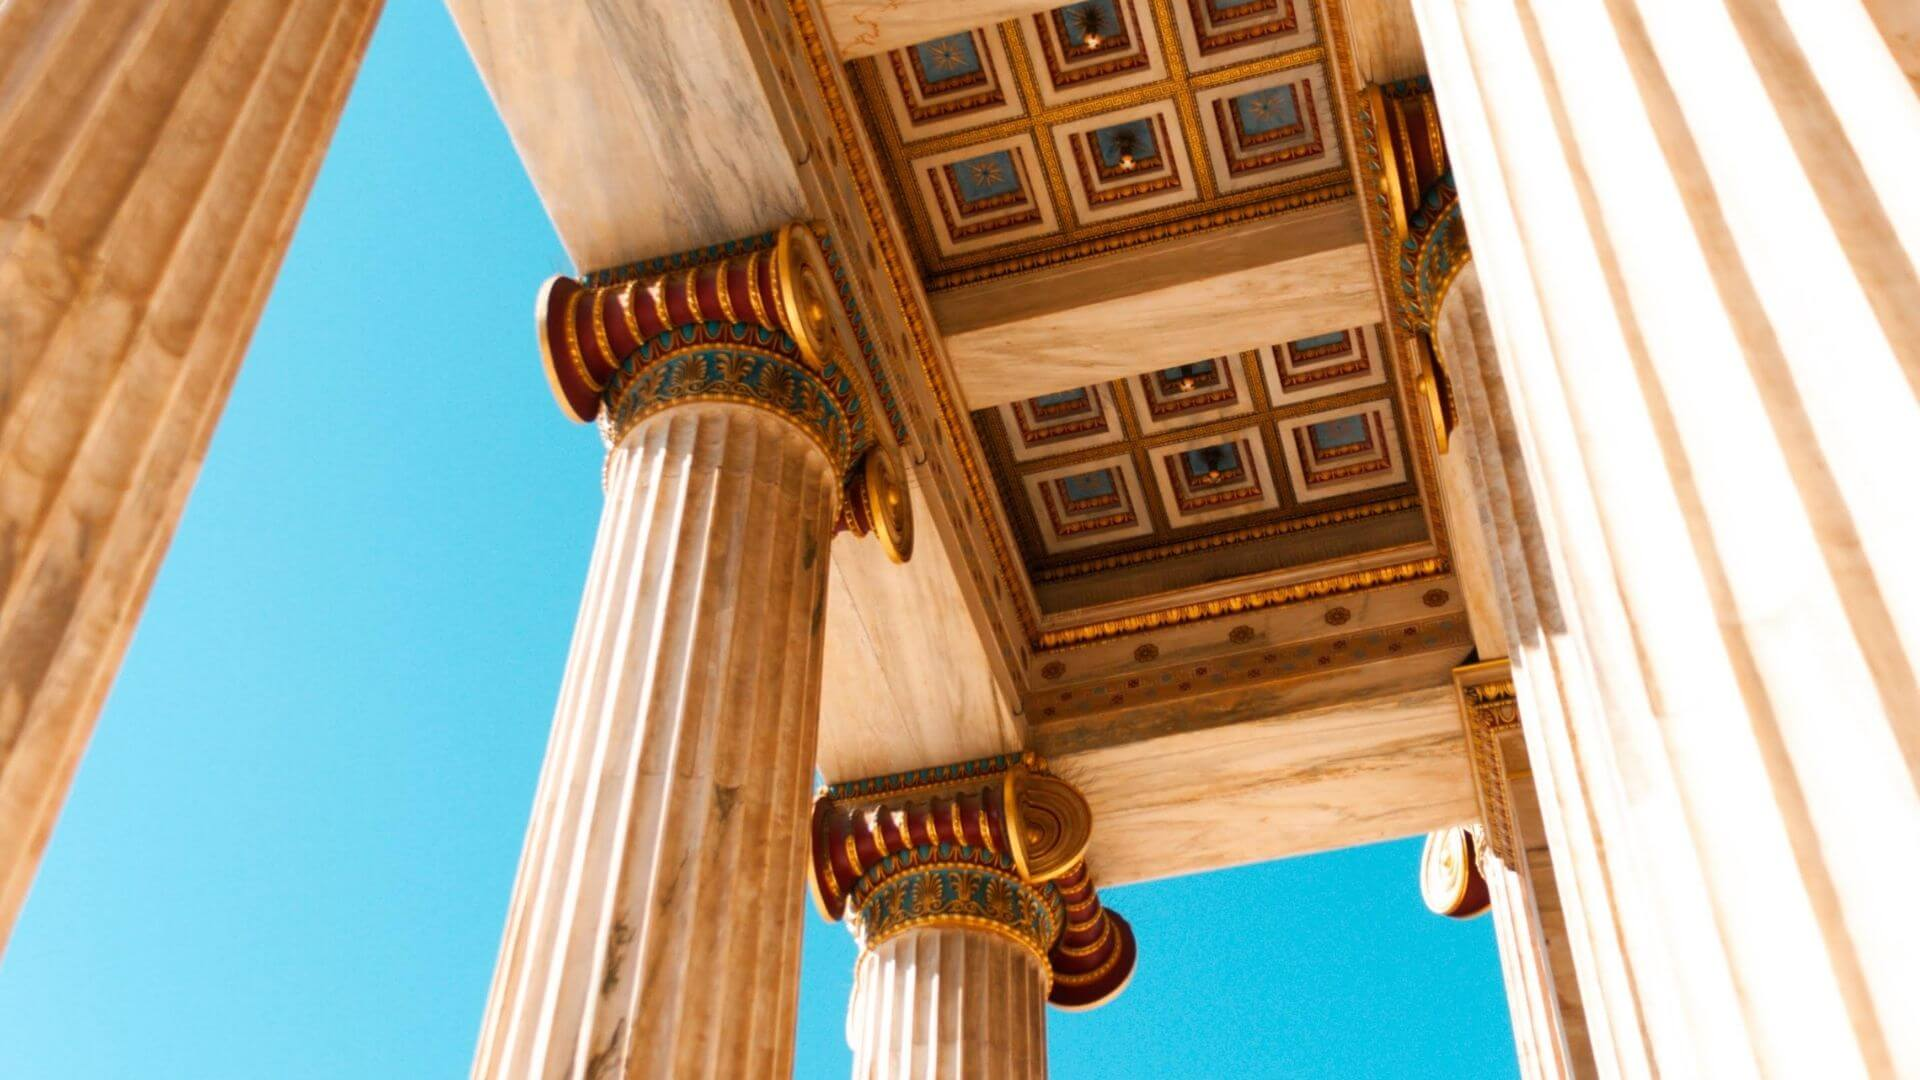 Greece's myDATA mandate postponed to September 2021